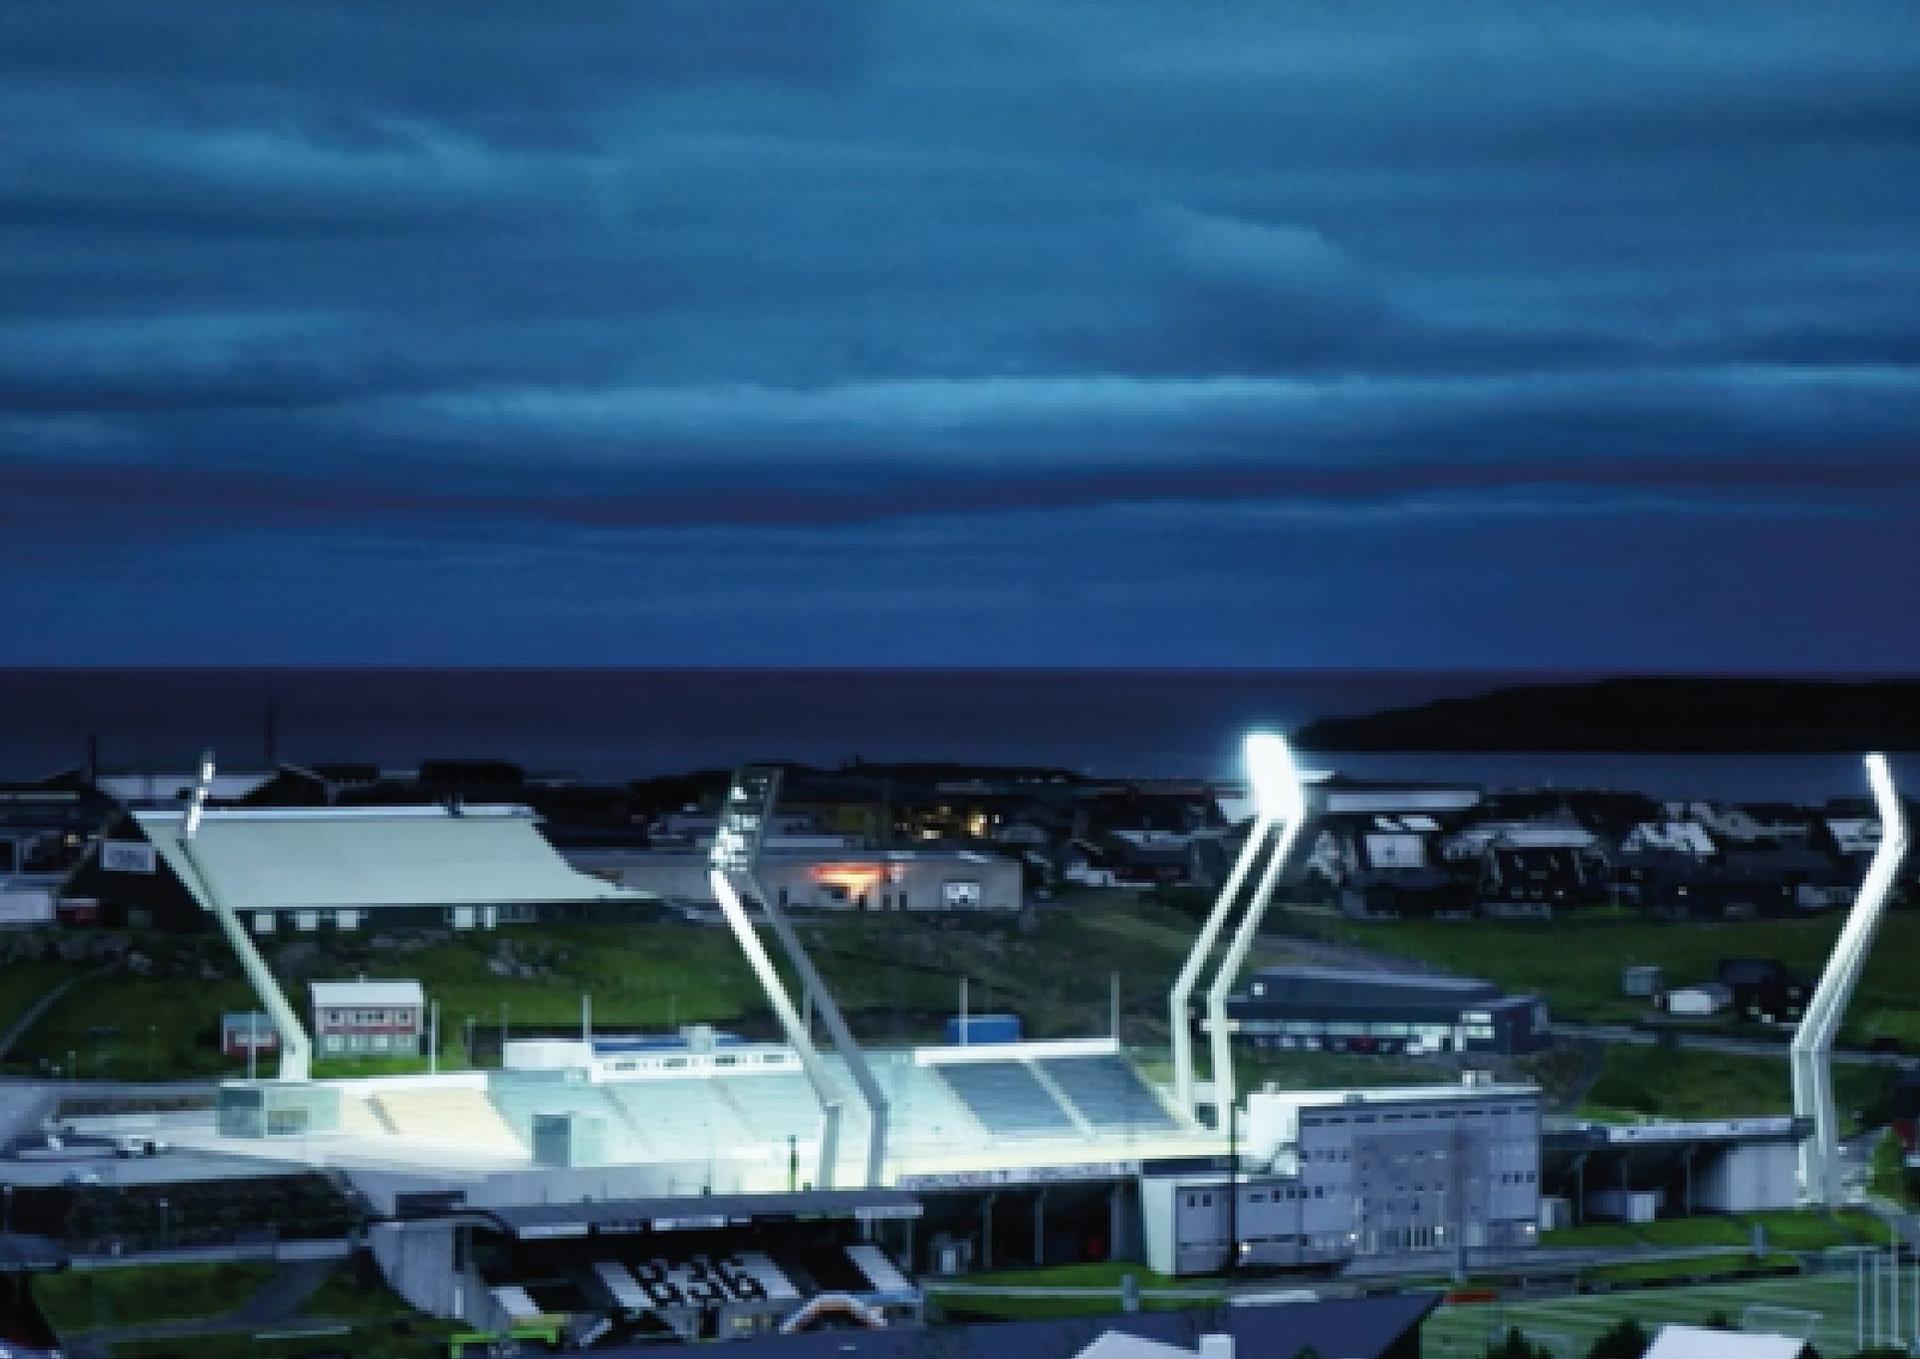 Torshavns kommune reklamespot